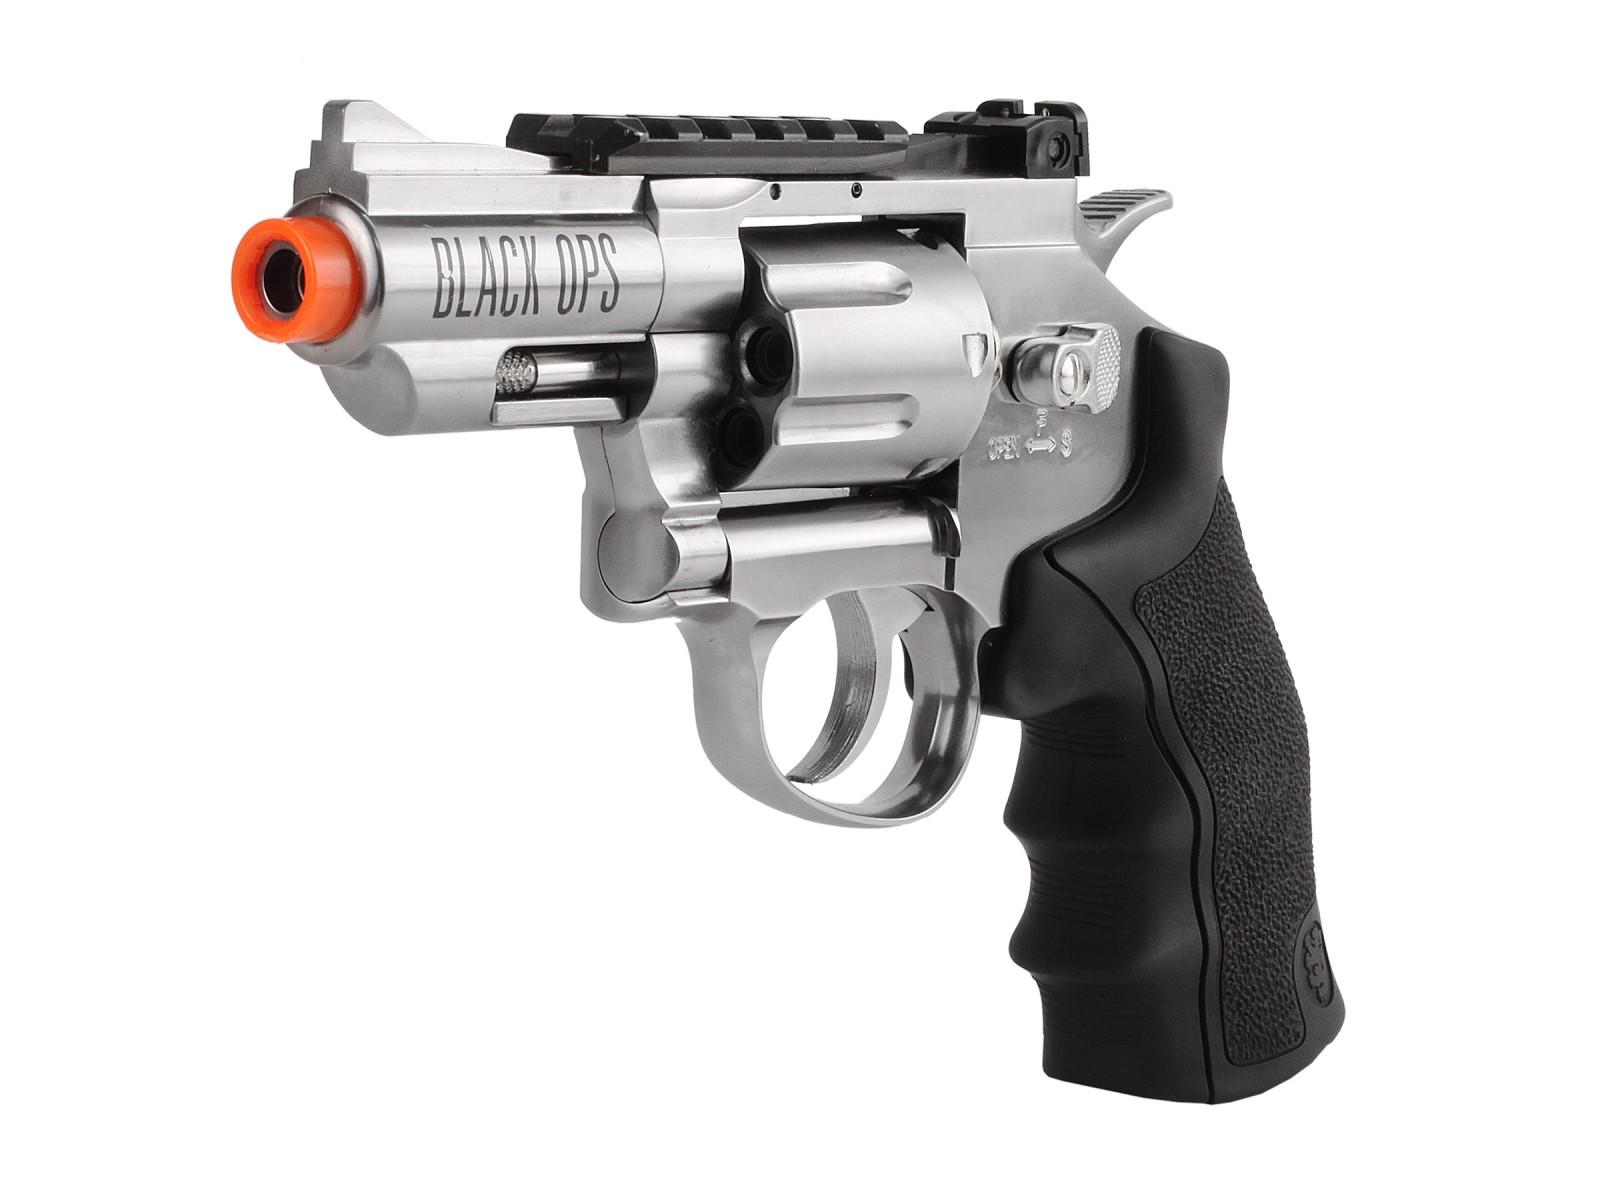 black ops co2 revolver bb gun